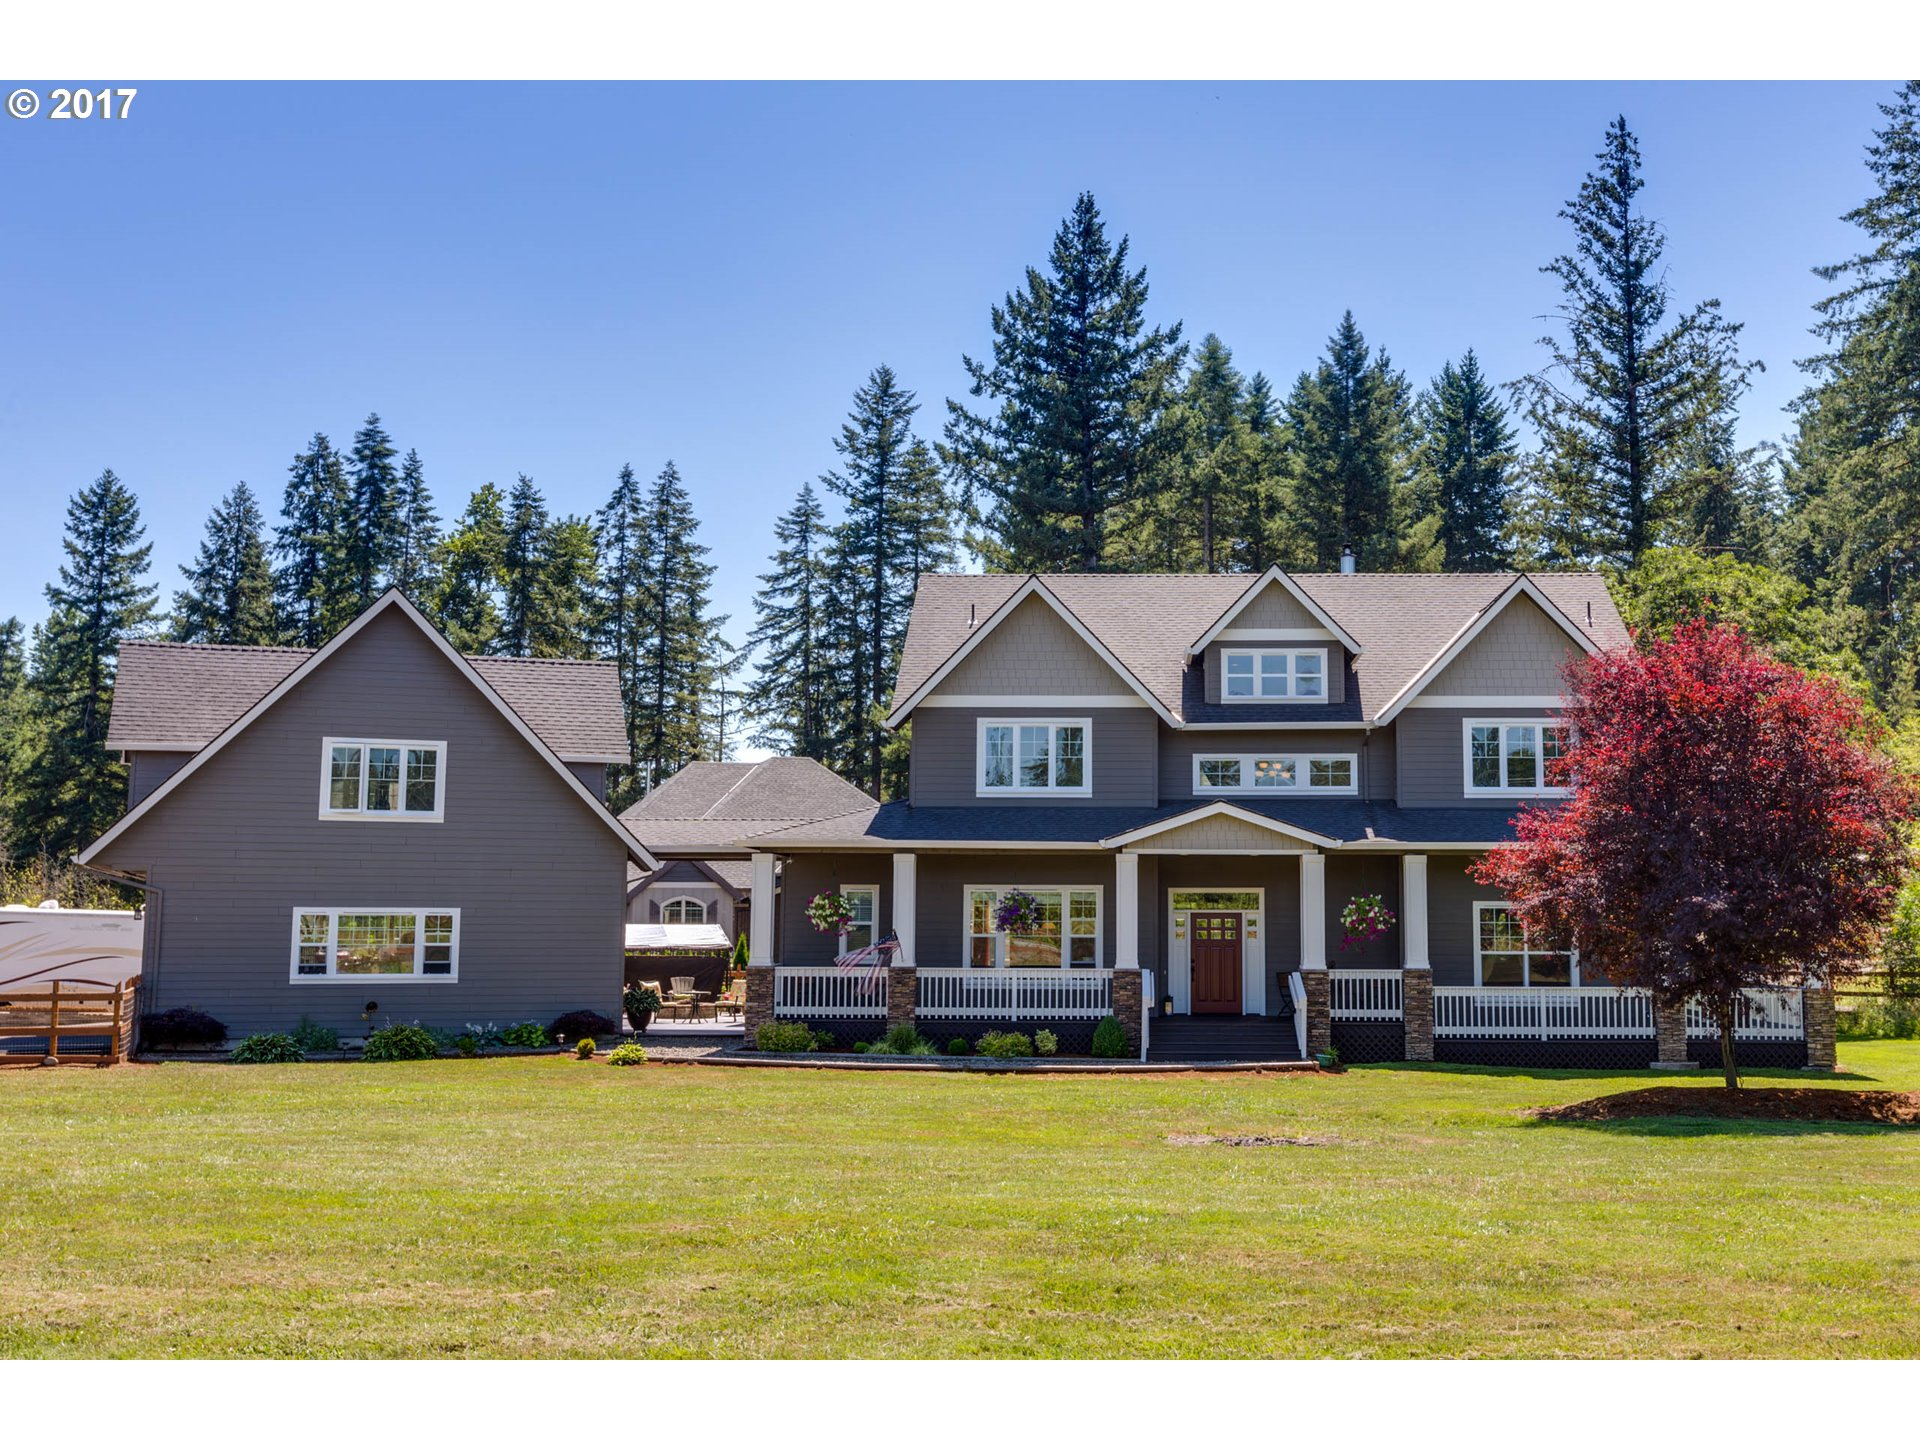 18273 S NANCY JEAN WAY, Oregon City OR 97045